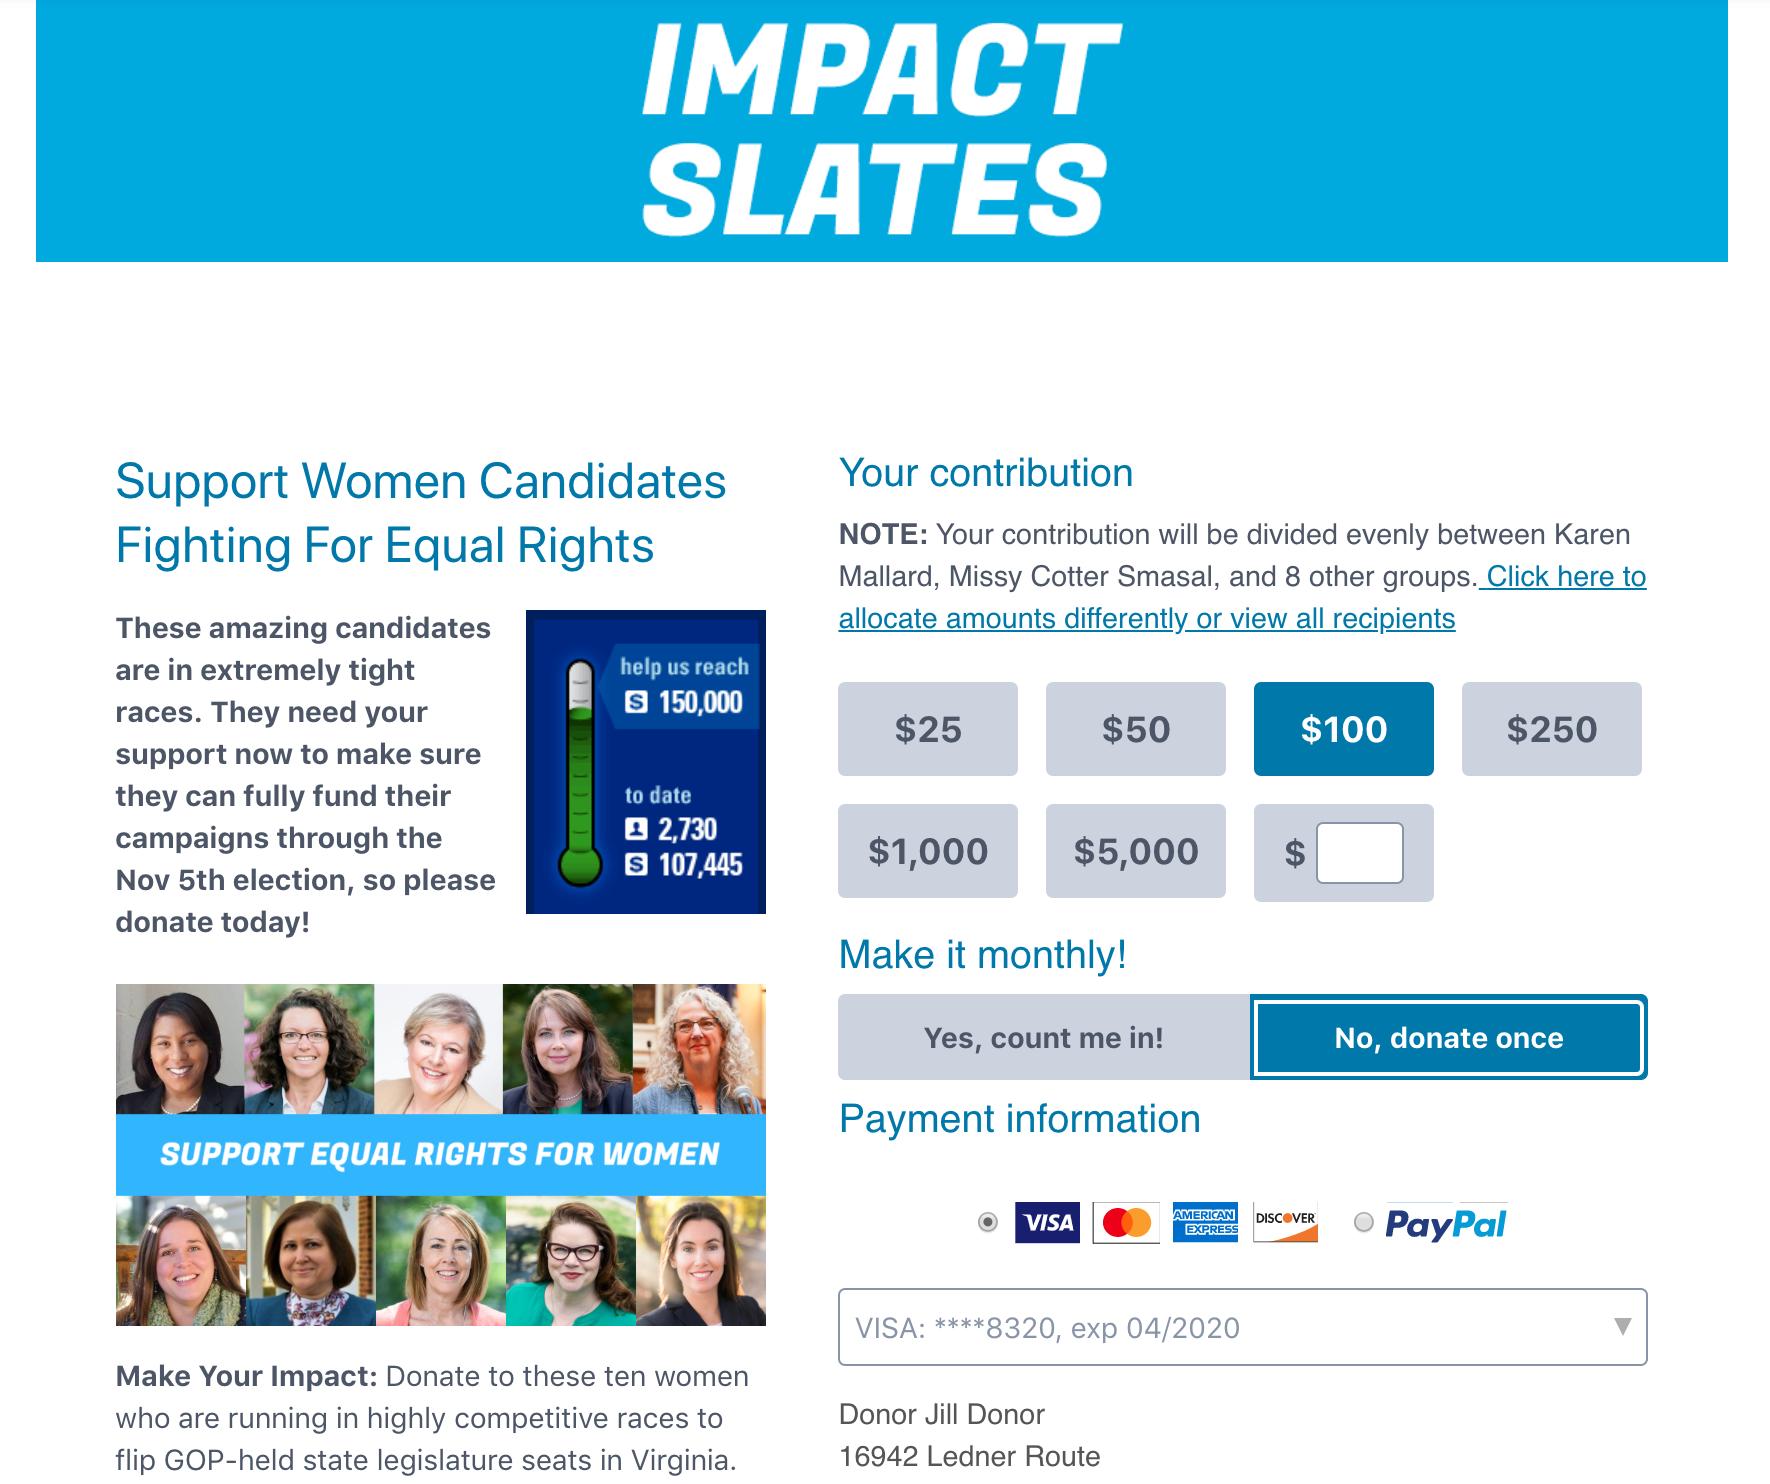 Impact Slates